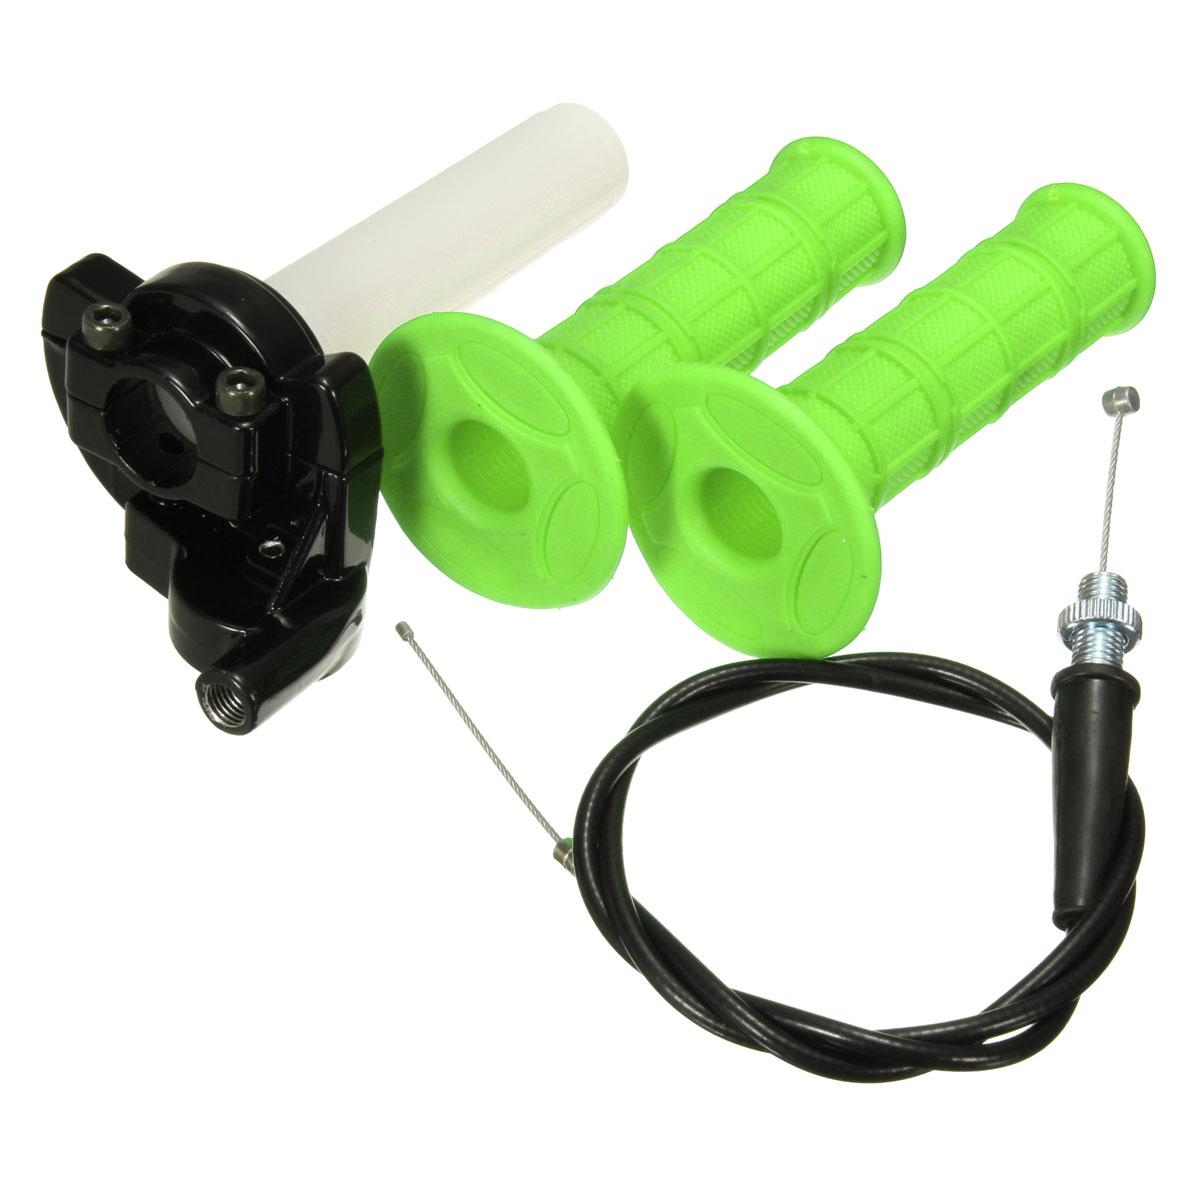 "MATCC Quick Action Throttle Grip handgrips Twist Cable For 90 110 125cc ATV Pit Dirt Bike 22mm 7/8"" Handlebar Green"